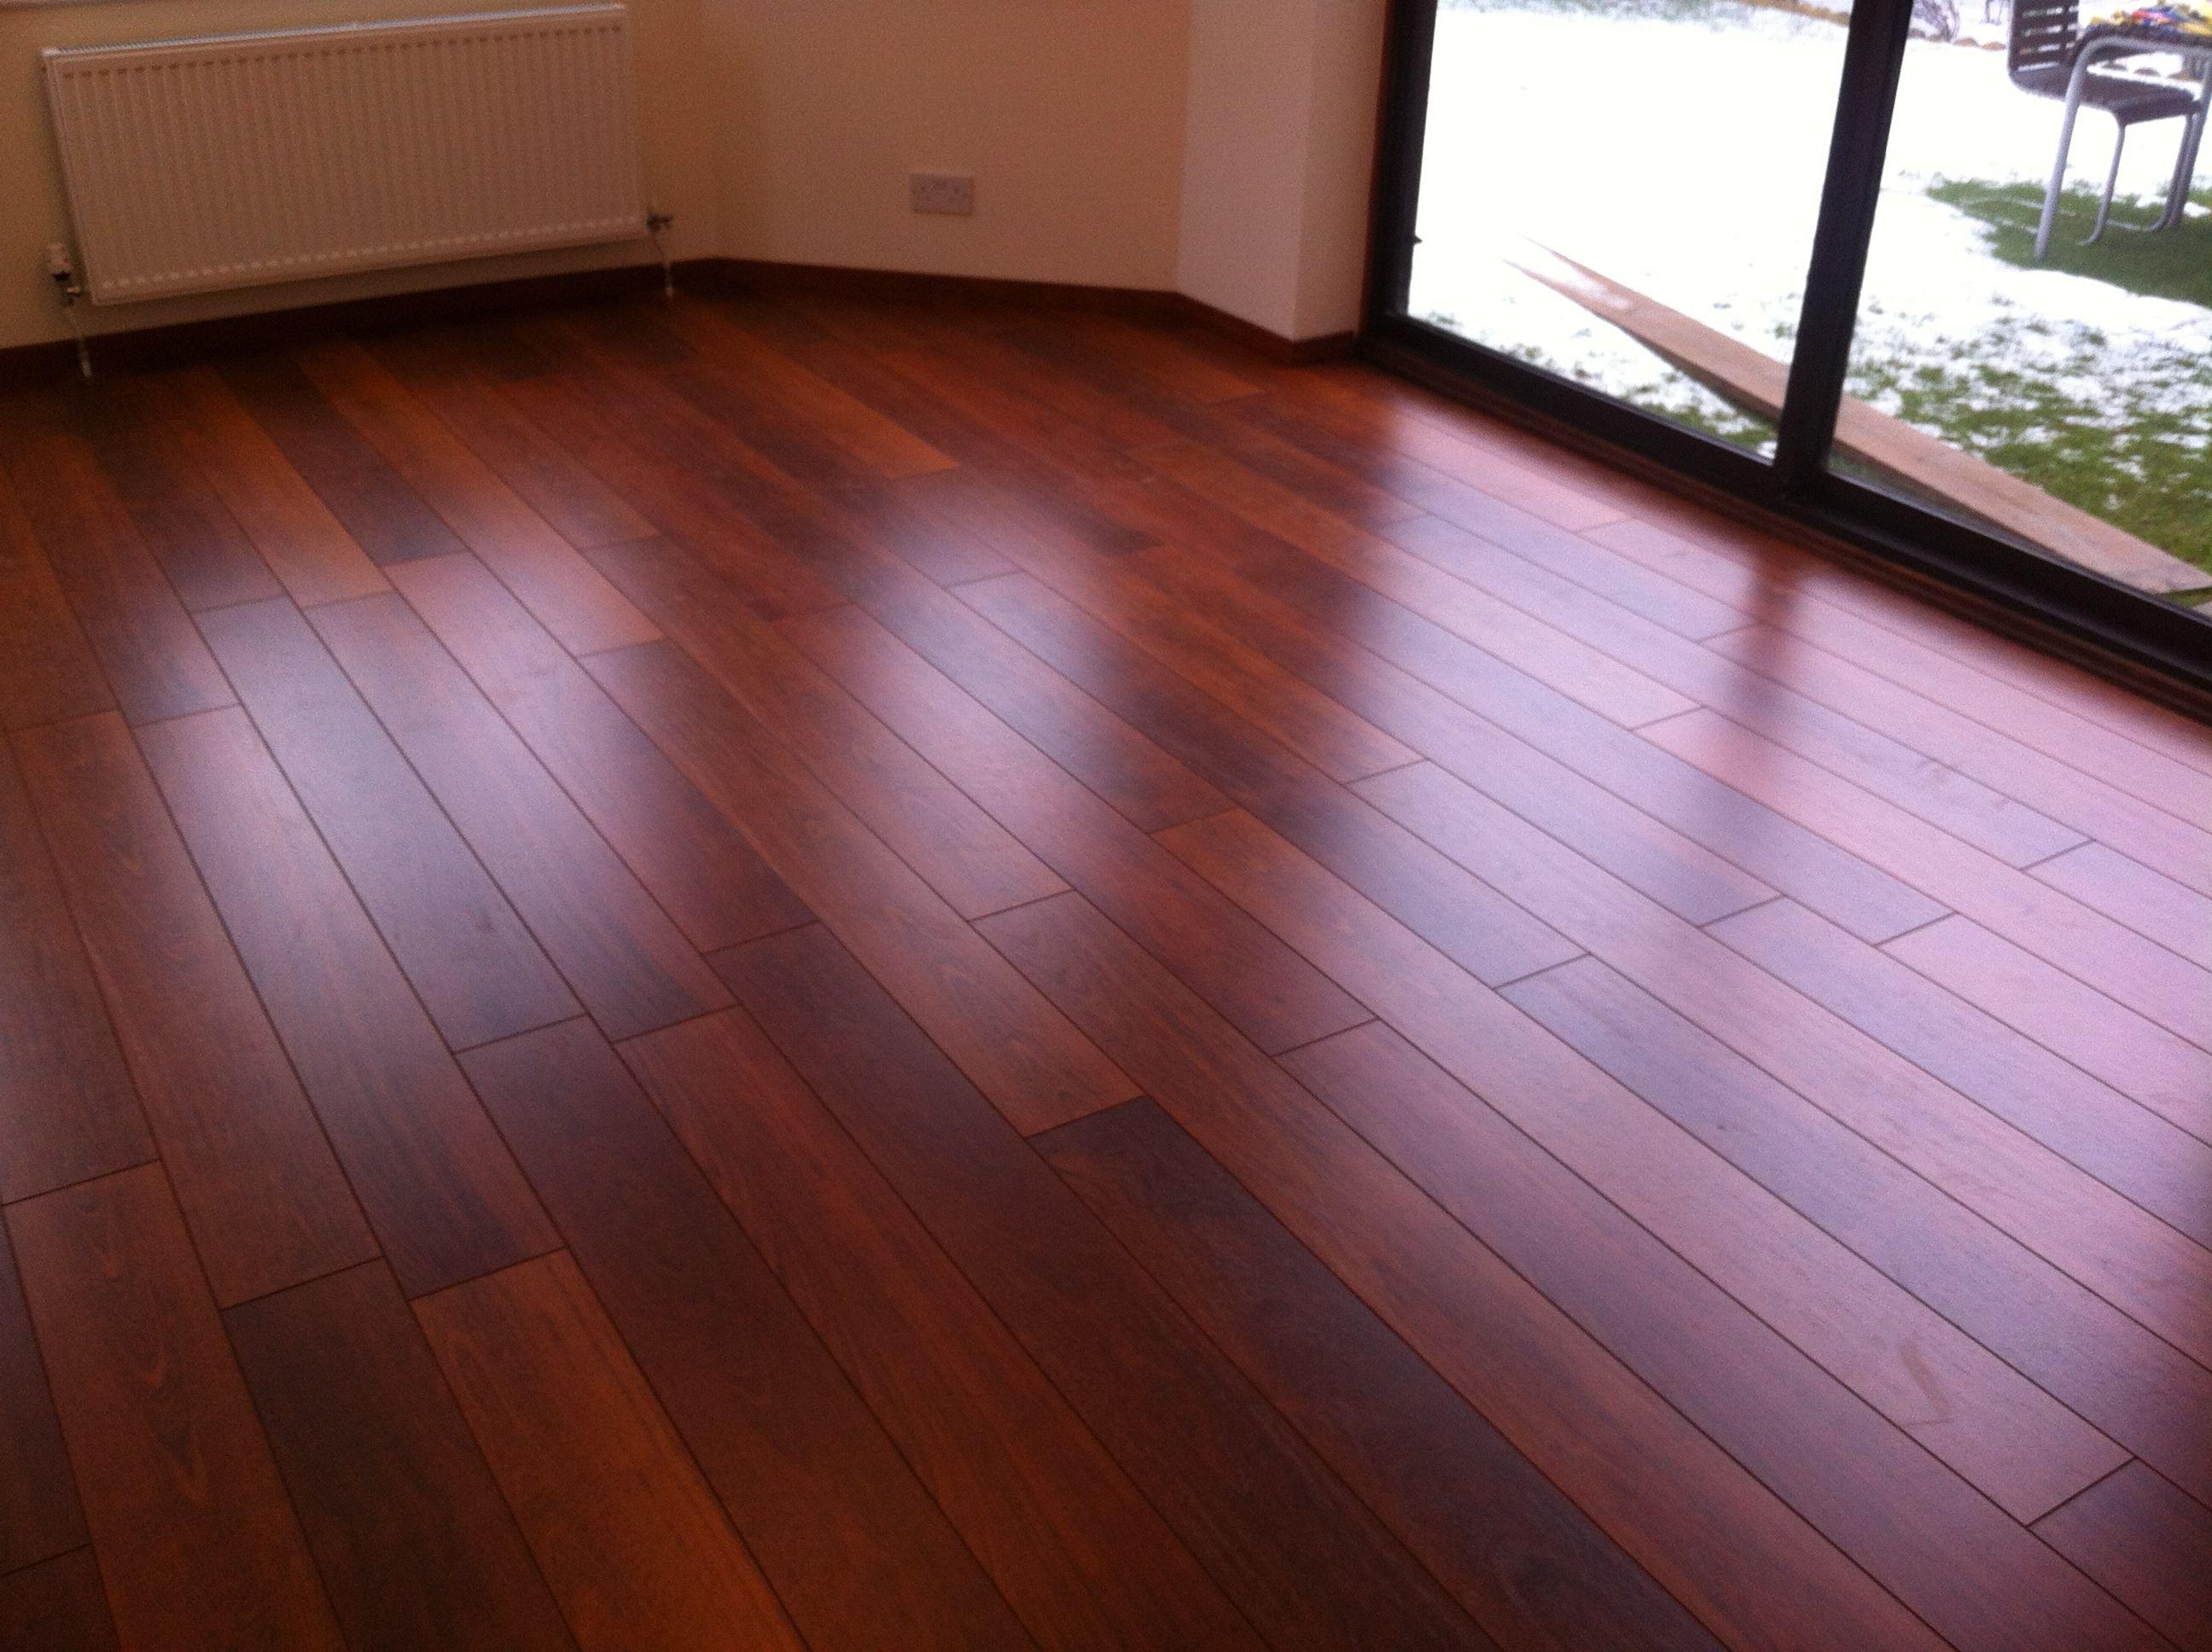 amish hand scraped hardwood flooring of merbau exotic hardwood flooring http glblcom com pinterest pertaining to merbau exotic hardwood flooring